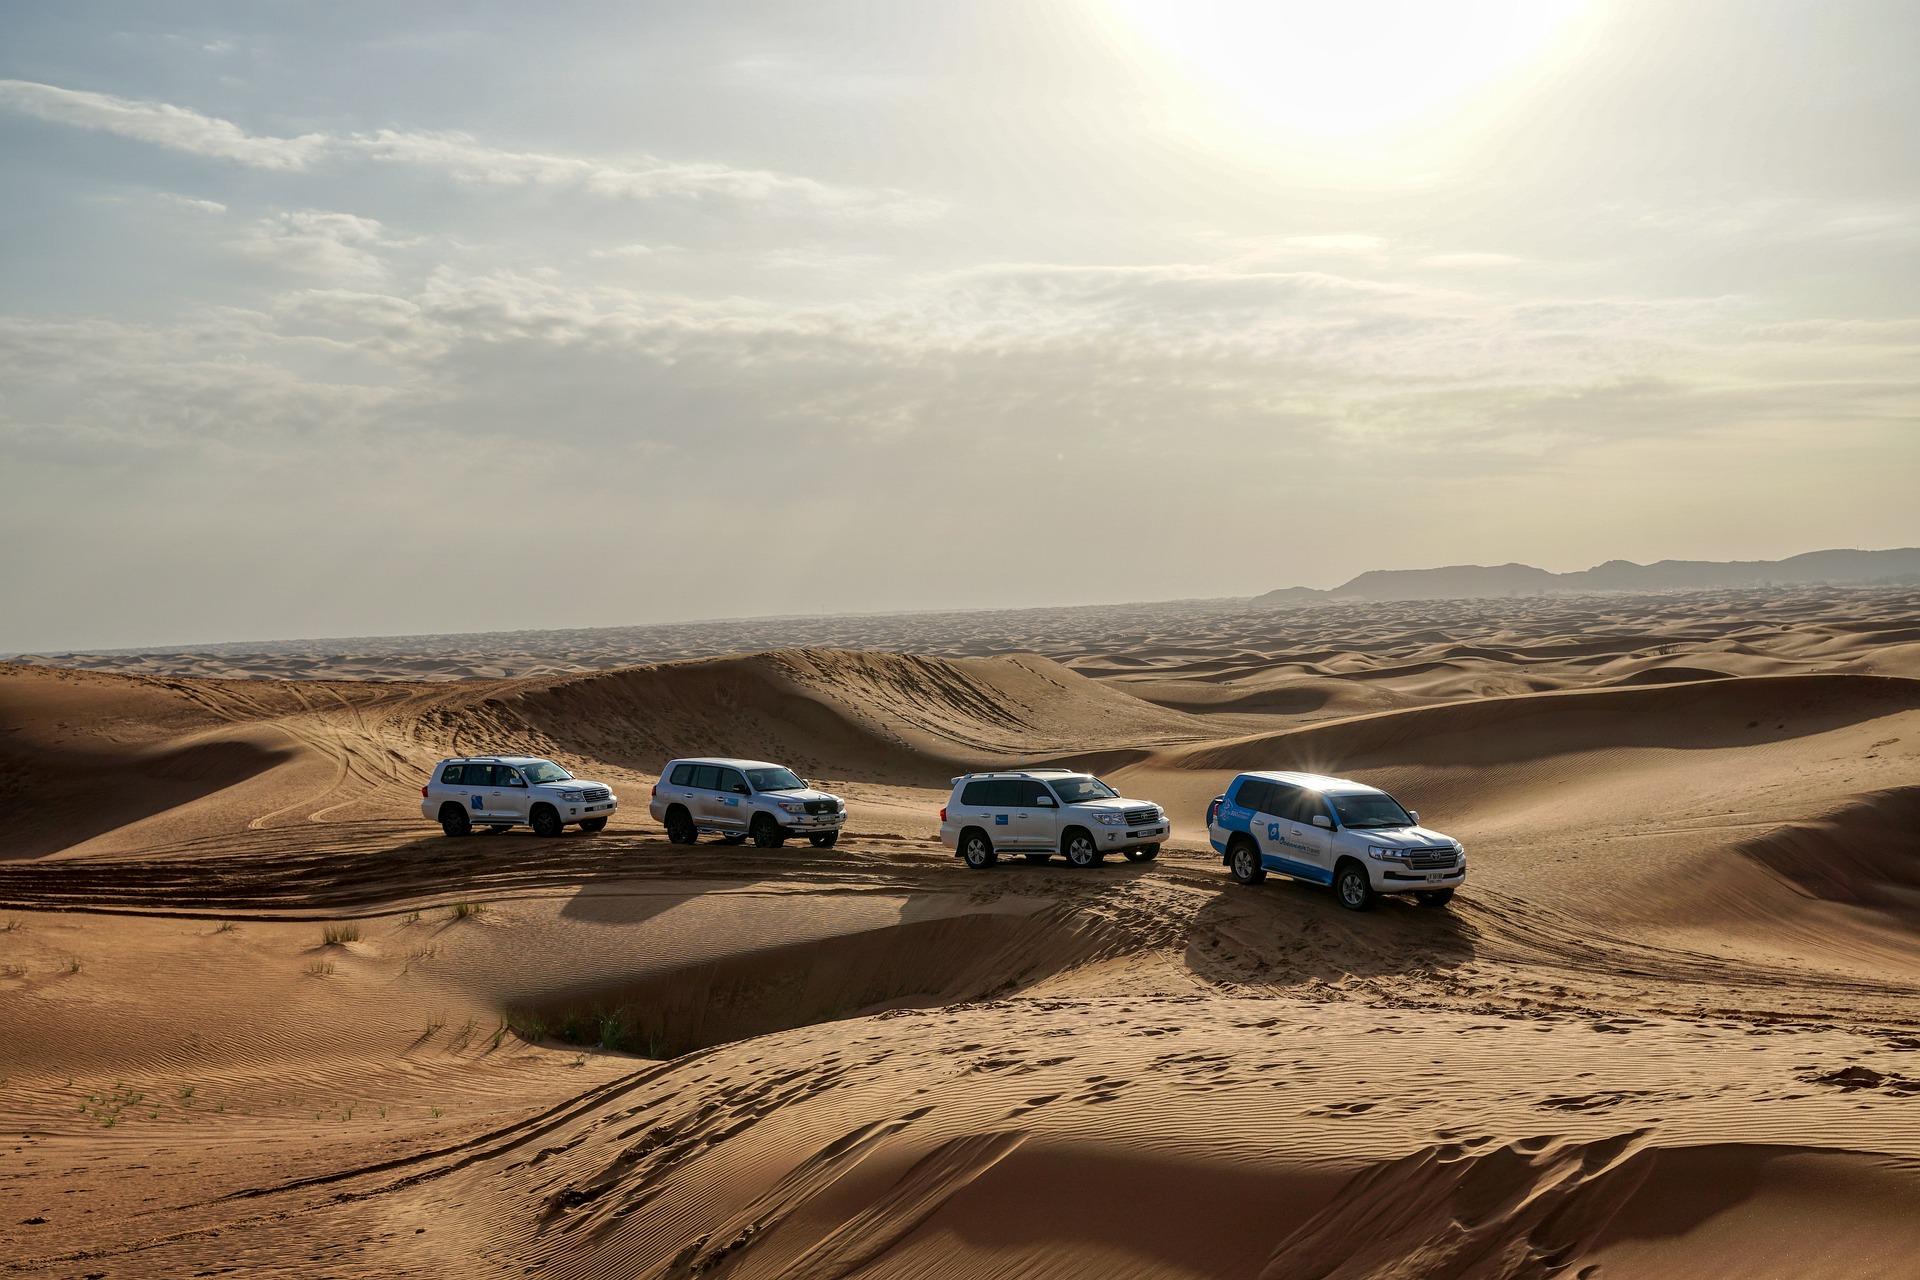 Wahibská poušť